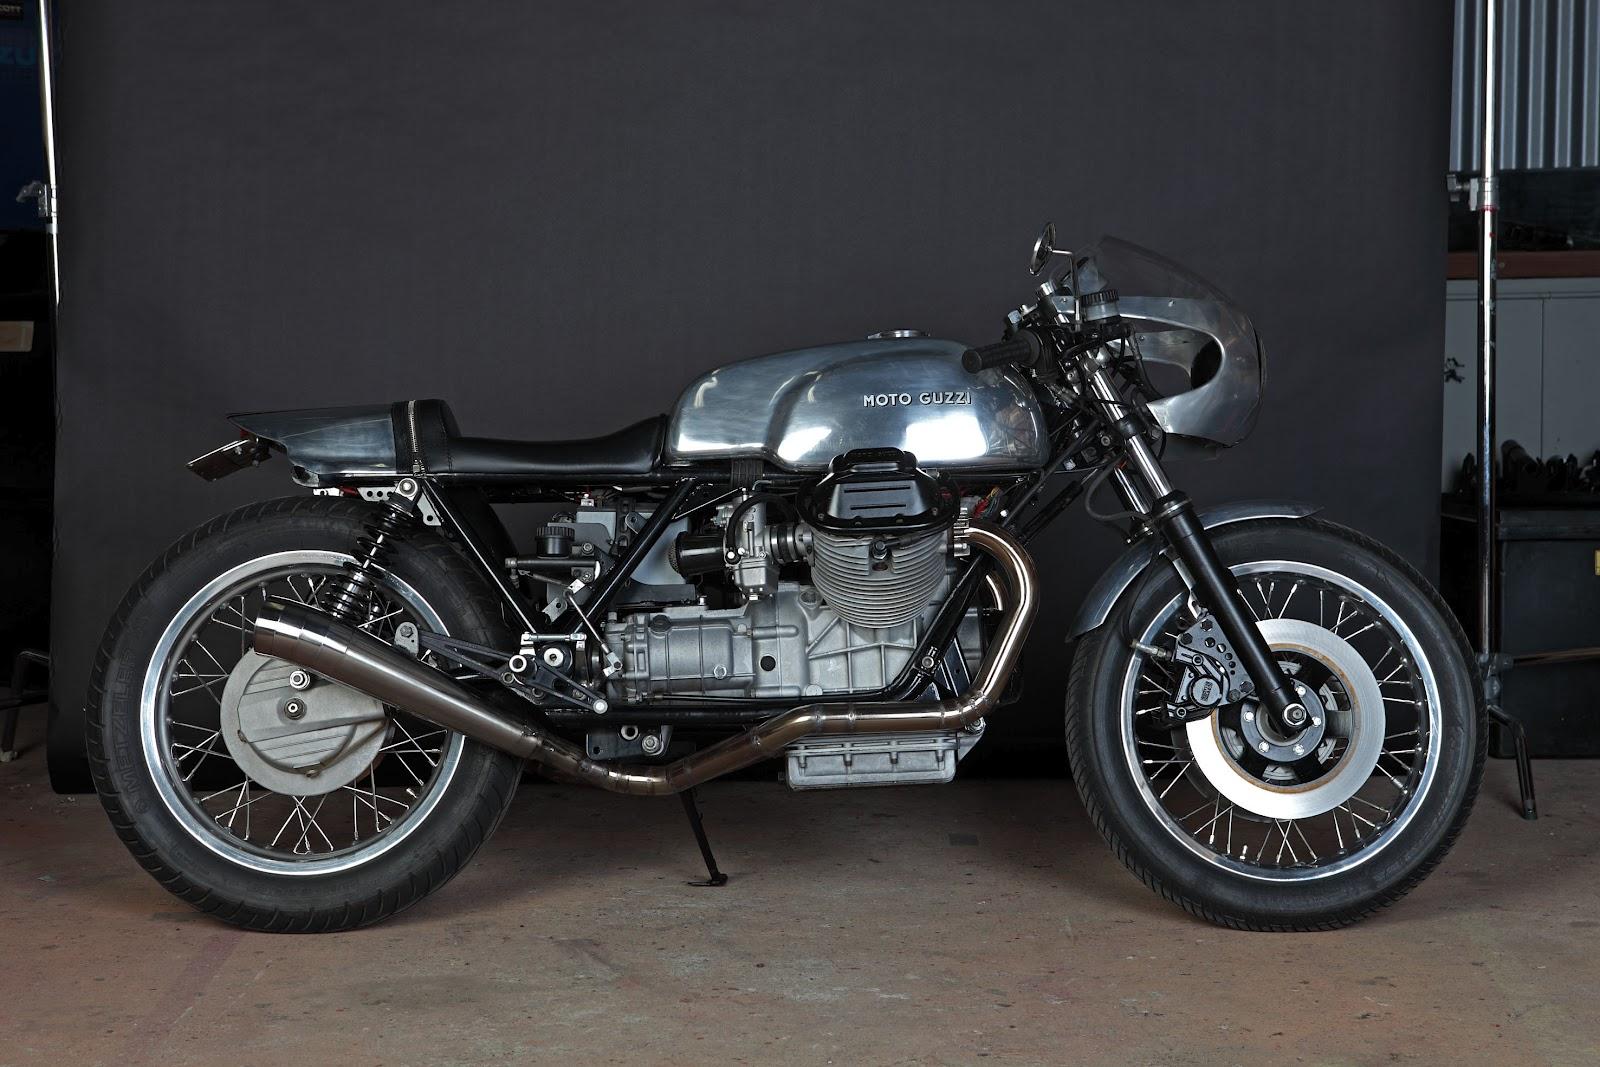 Return of the Cafe Racers - Machine Moto Guzzi Mk1 Le Mans